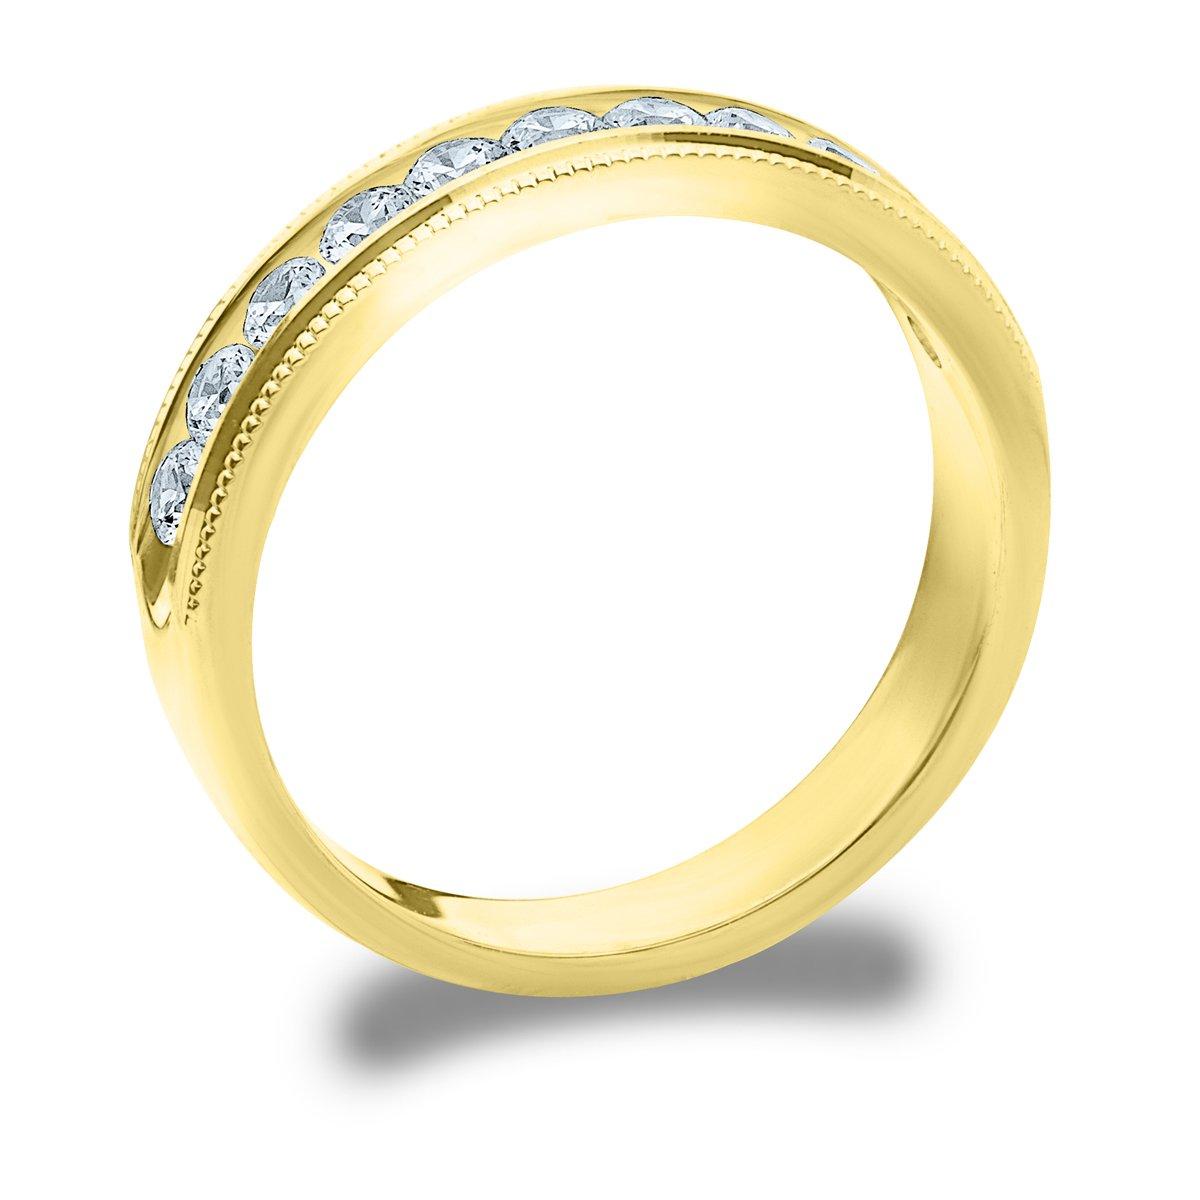 .50 CTTW Splendor Diamond Wedding Ring 1//2ct Milgrain Anniversary Band in 10K Gold